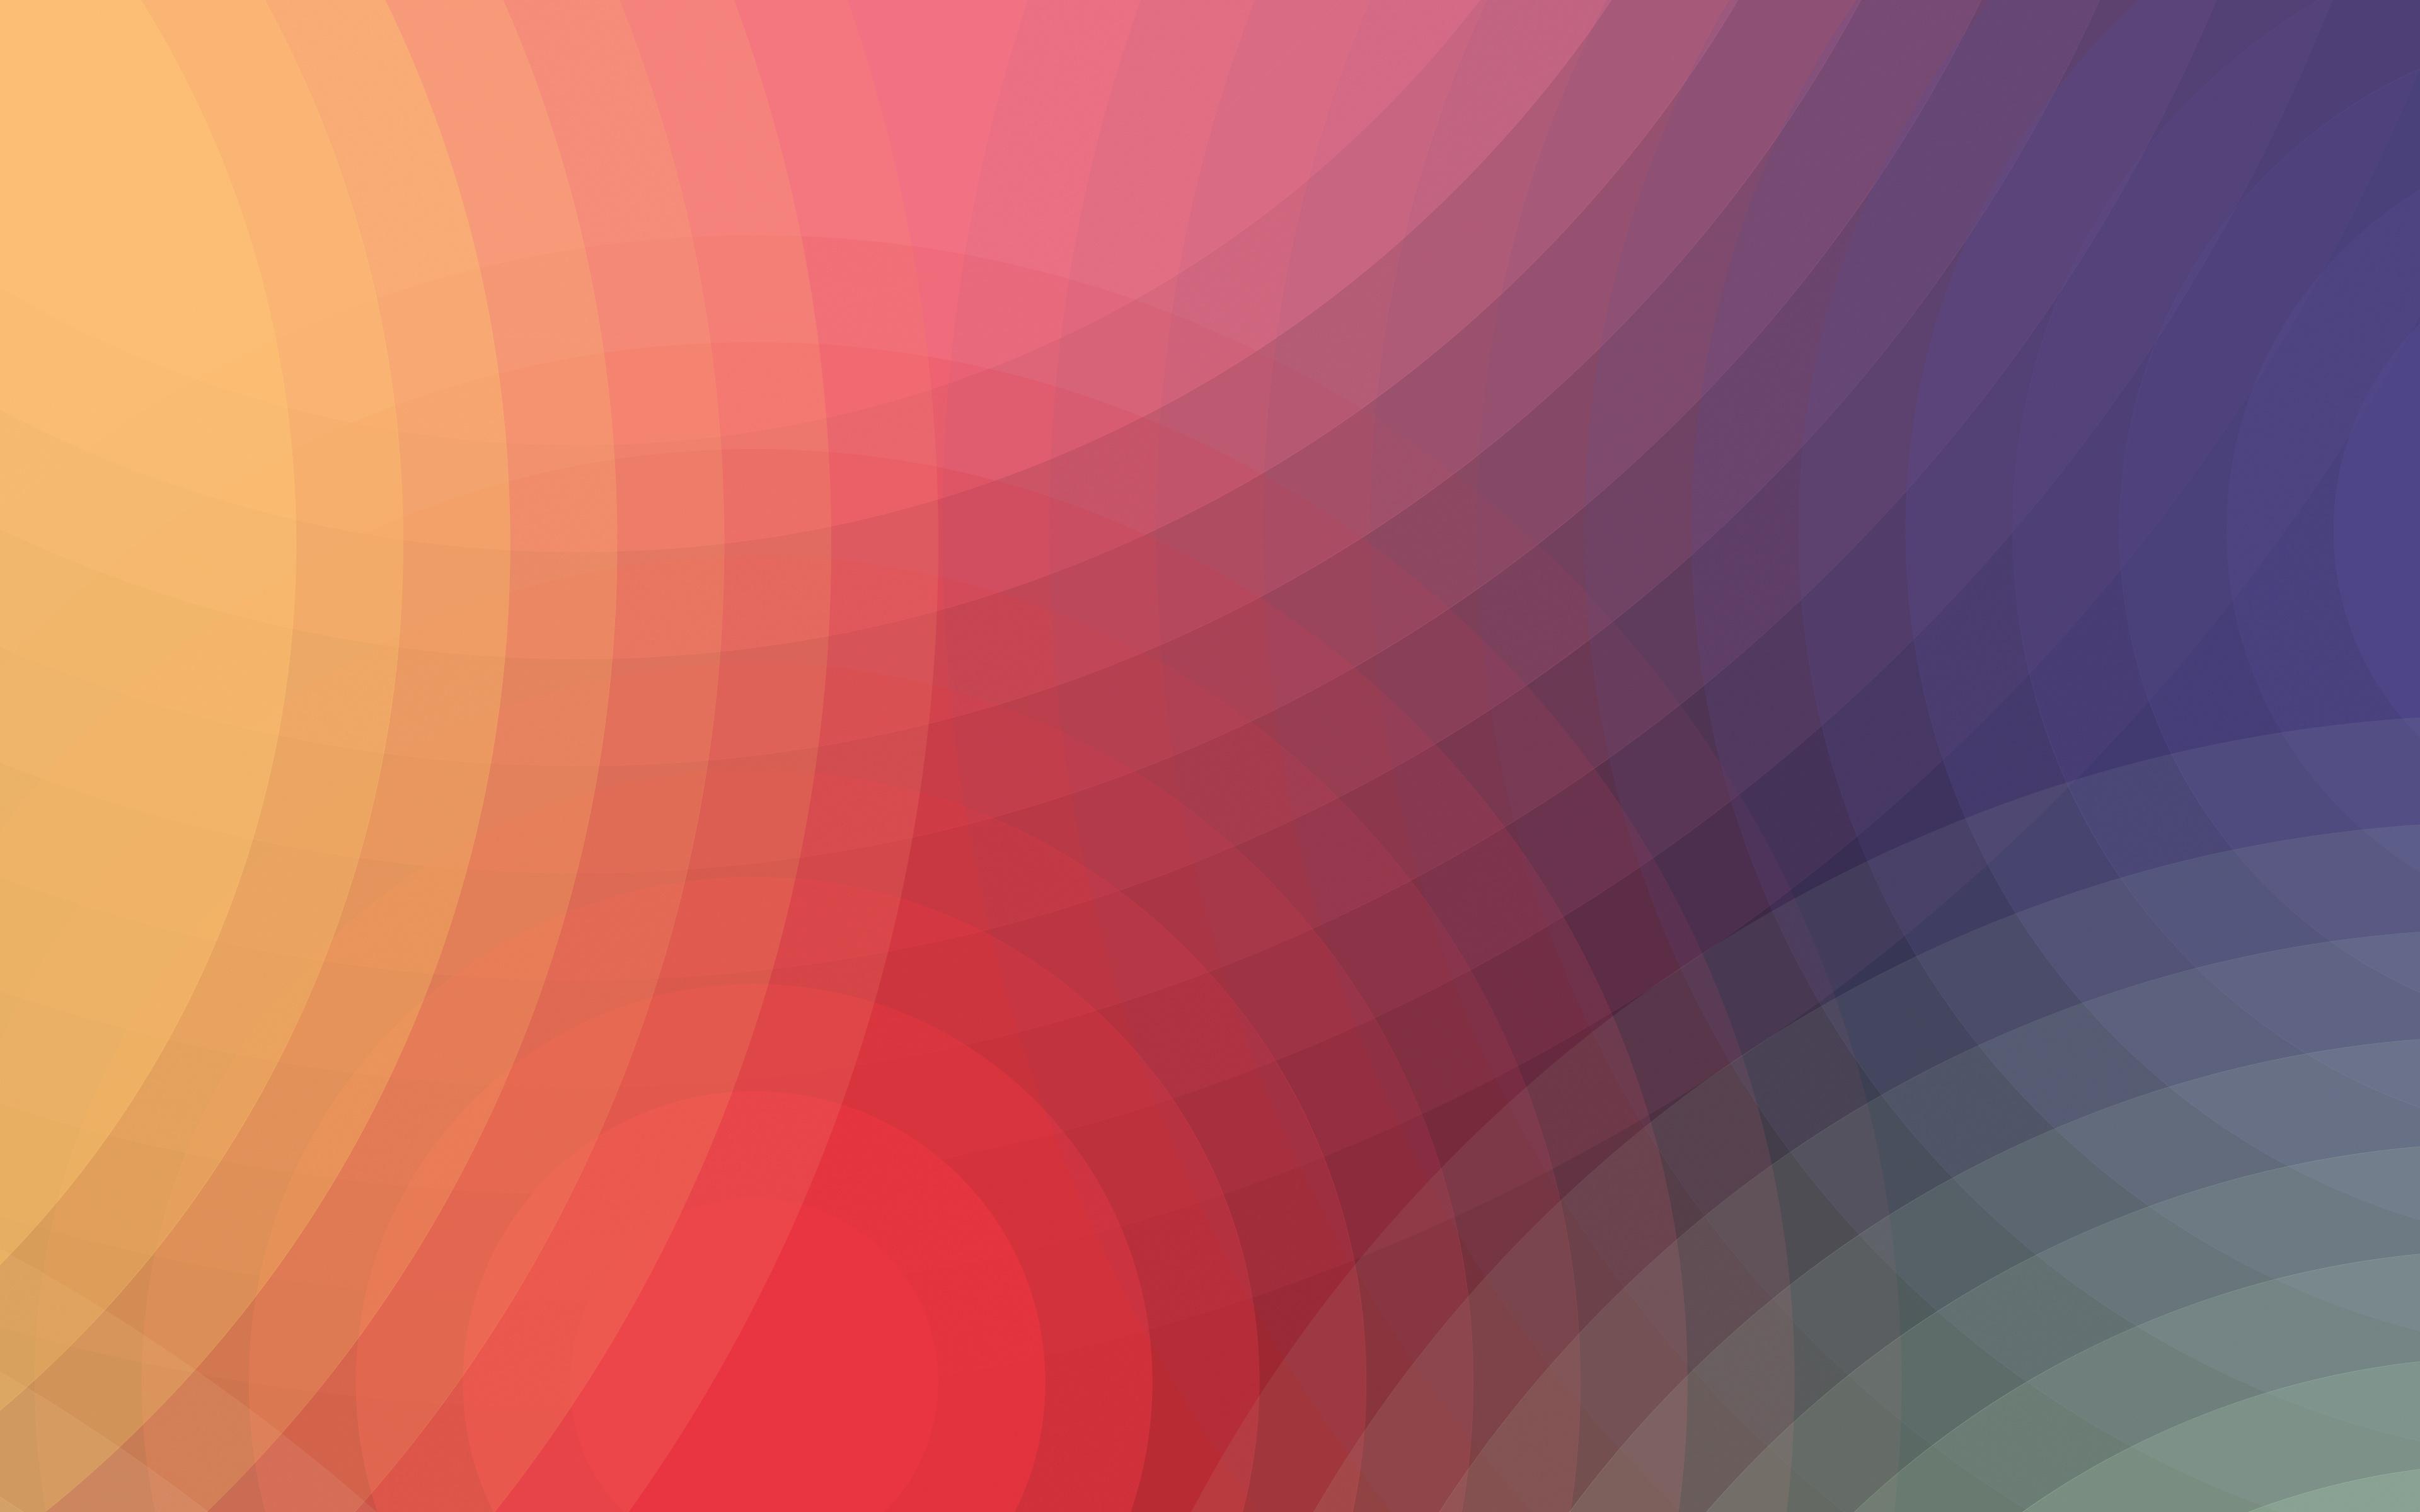 how to fix desktop background image to big